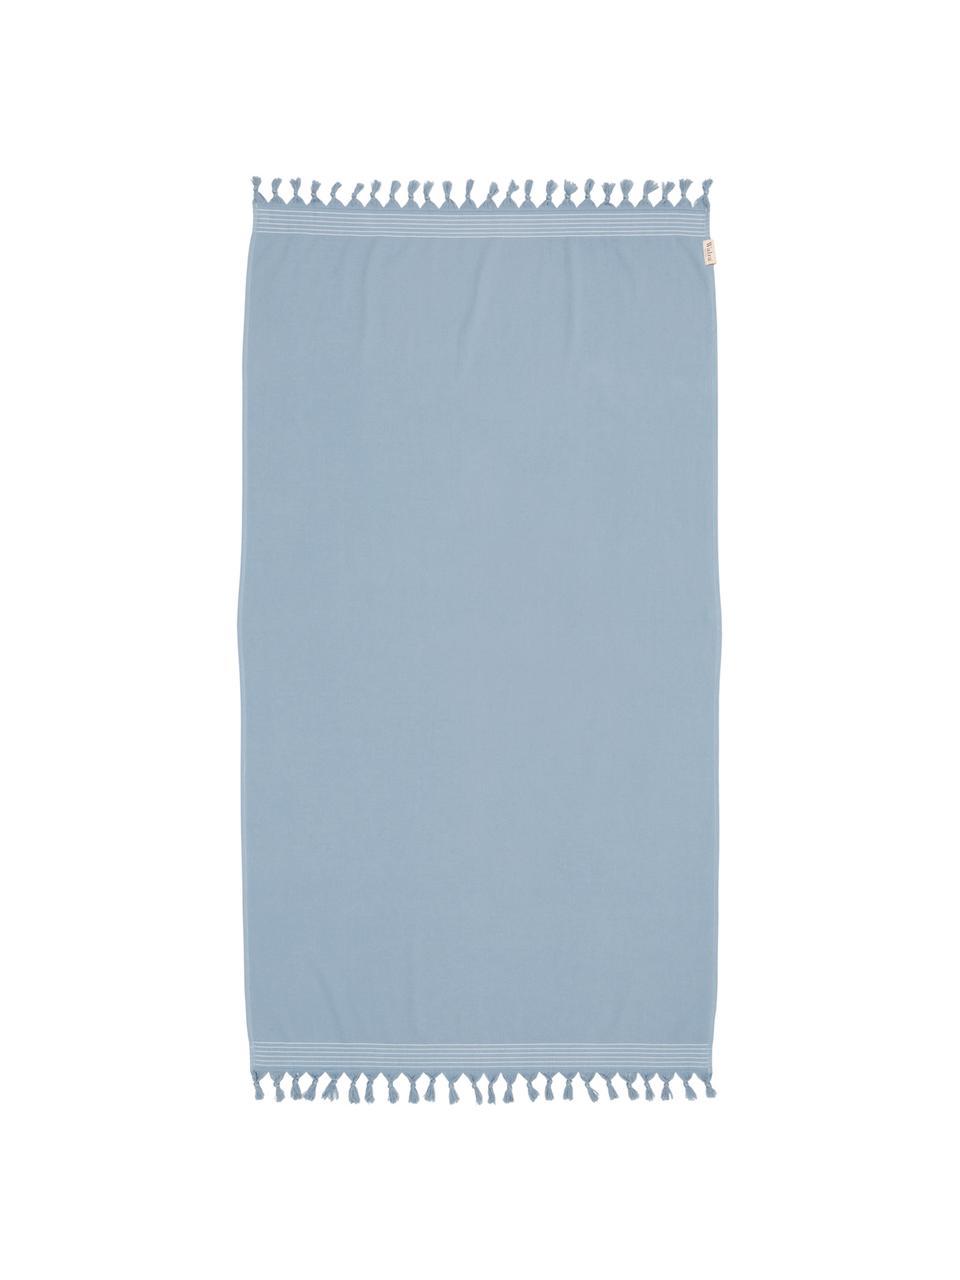 Telo mare Soft Cotton, Retro: Terry, Blu, bianco, Larg. 100 x Lung. 180 cm